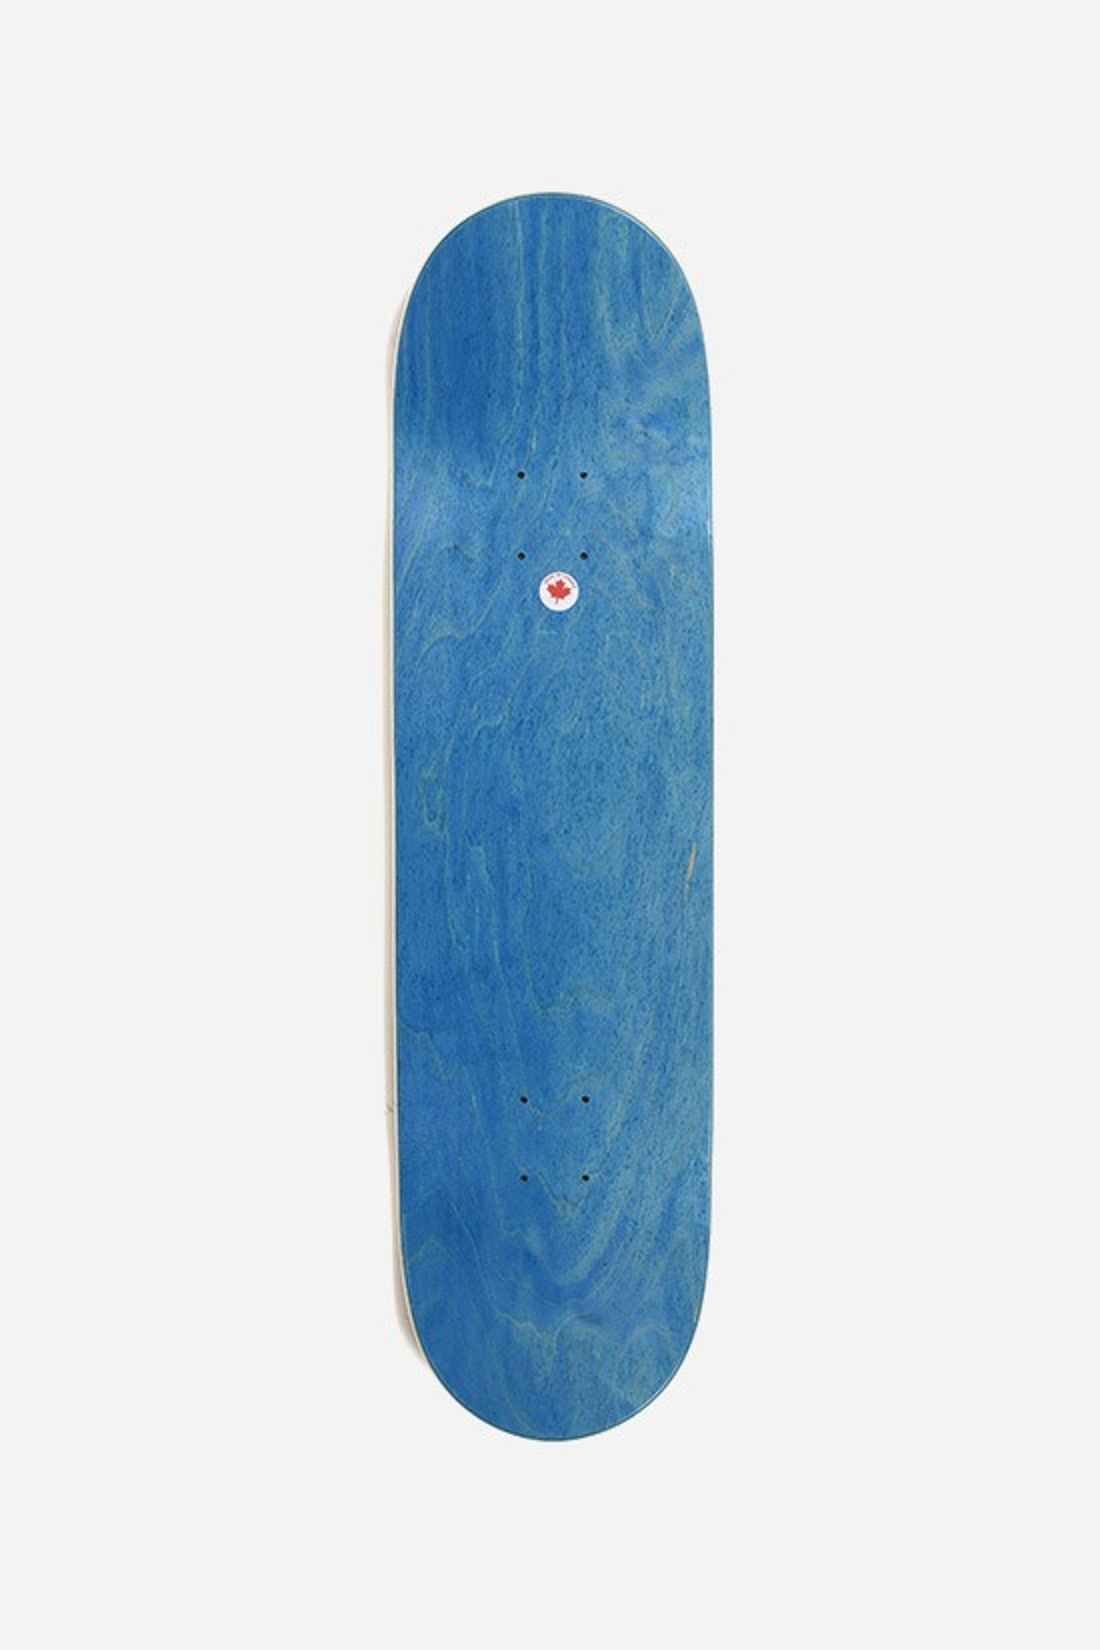 RAVE / Leo choet pro board Blue